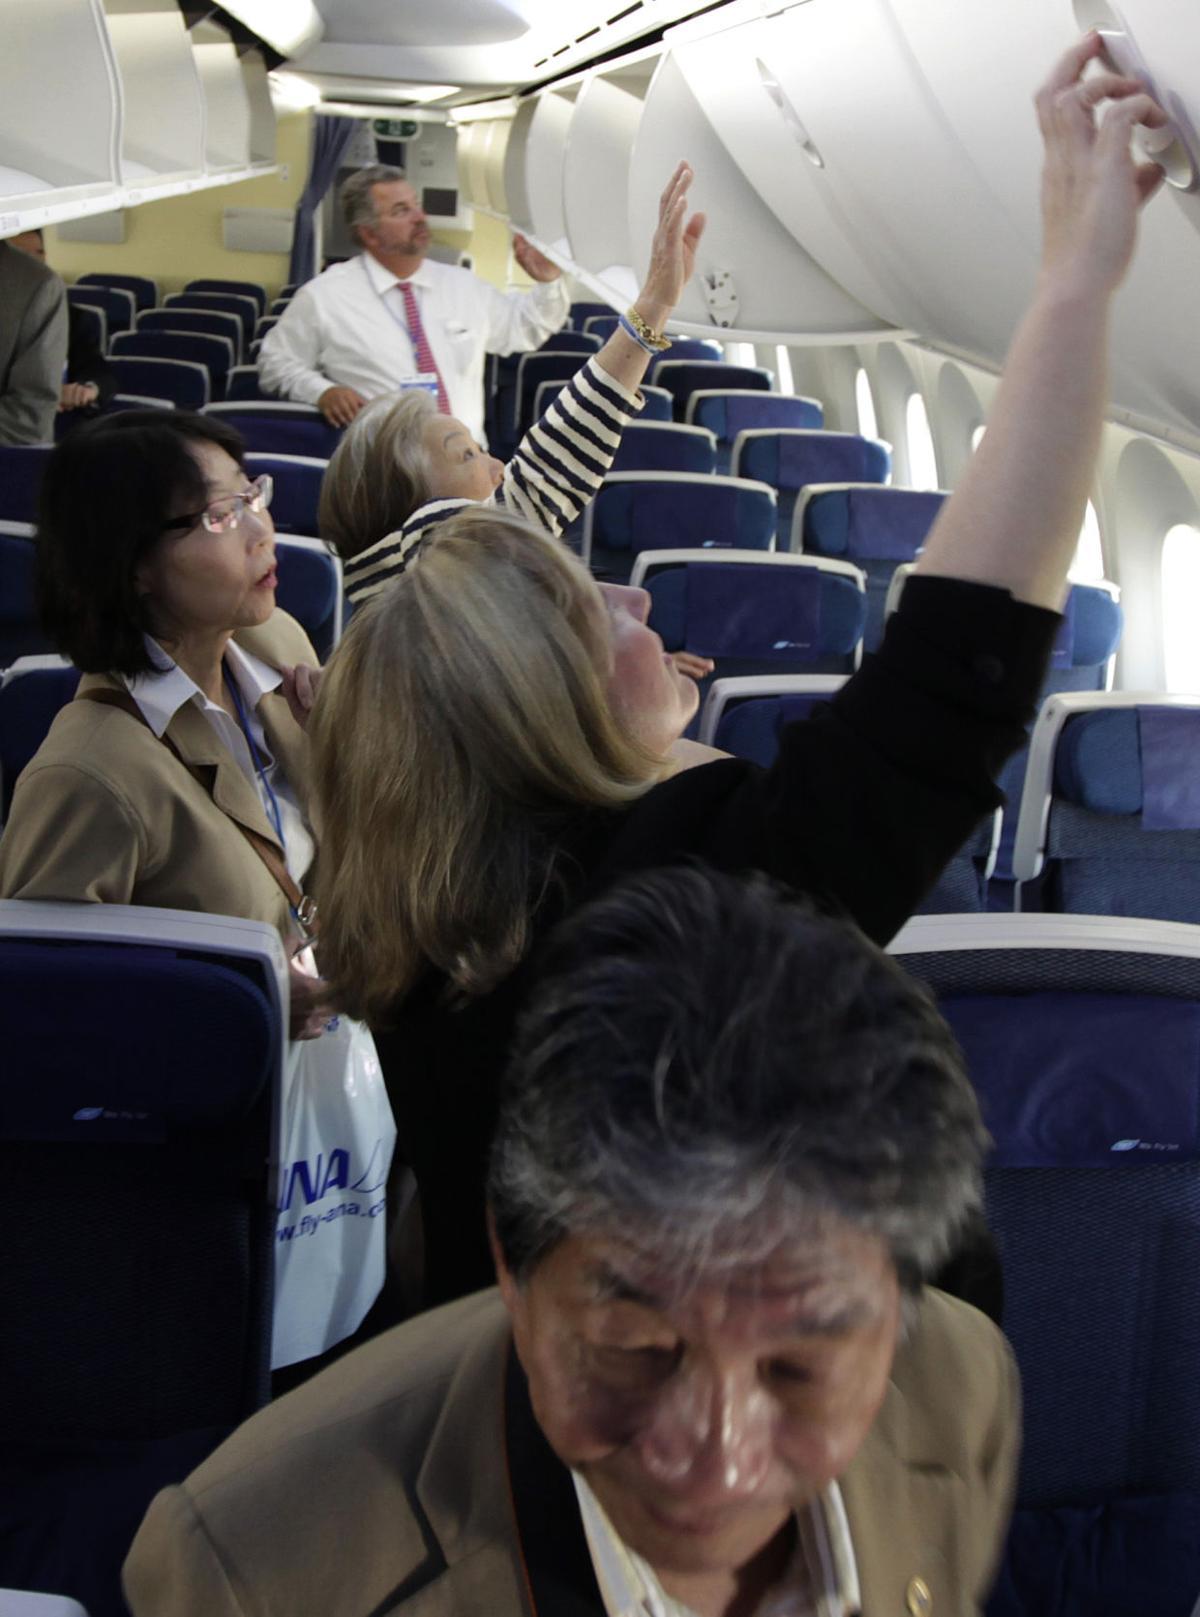 Boeing downplays union activity